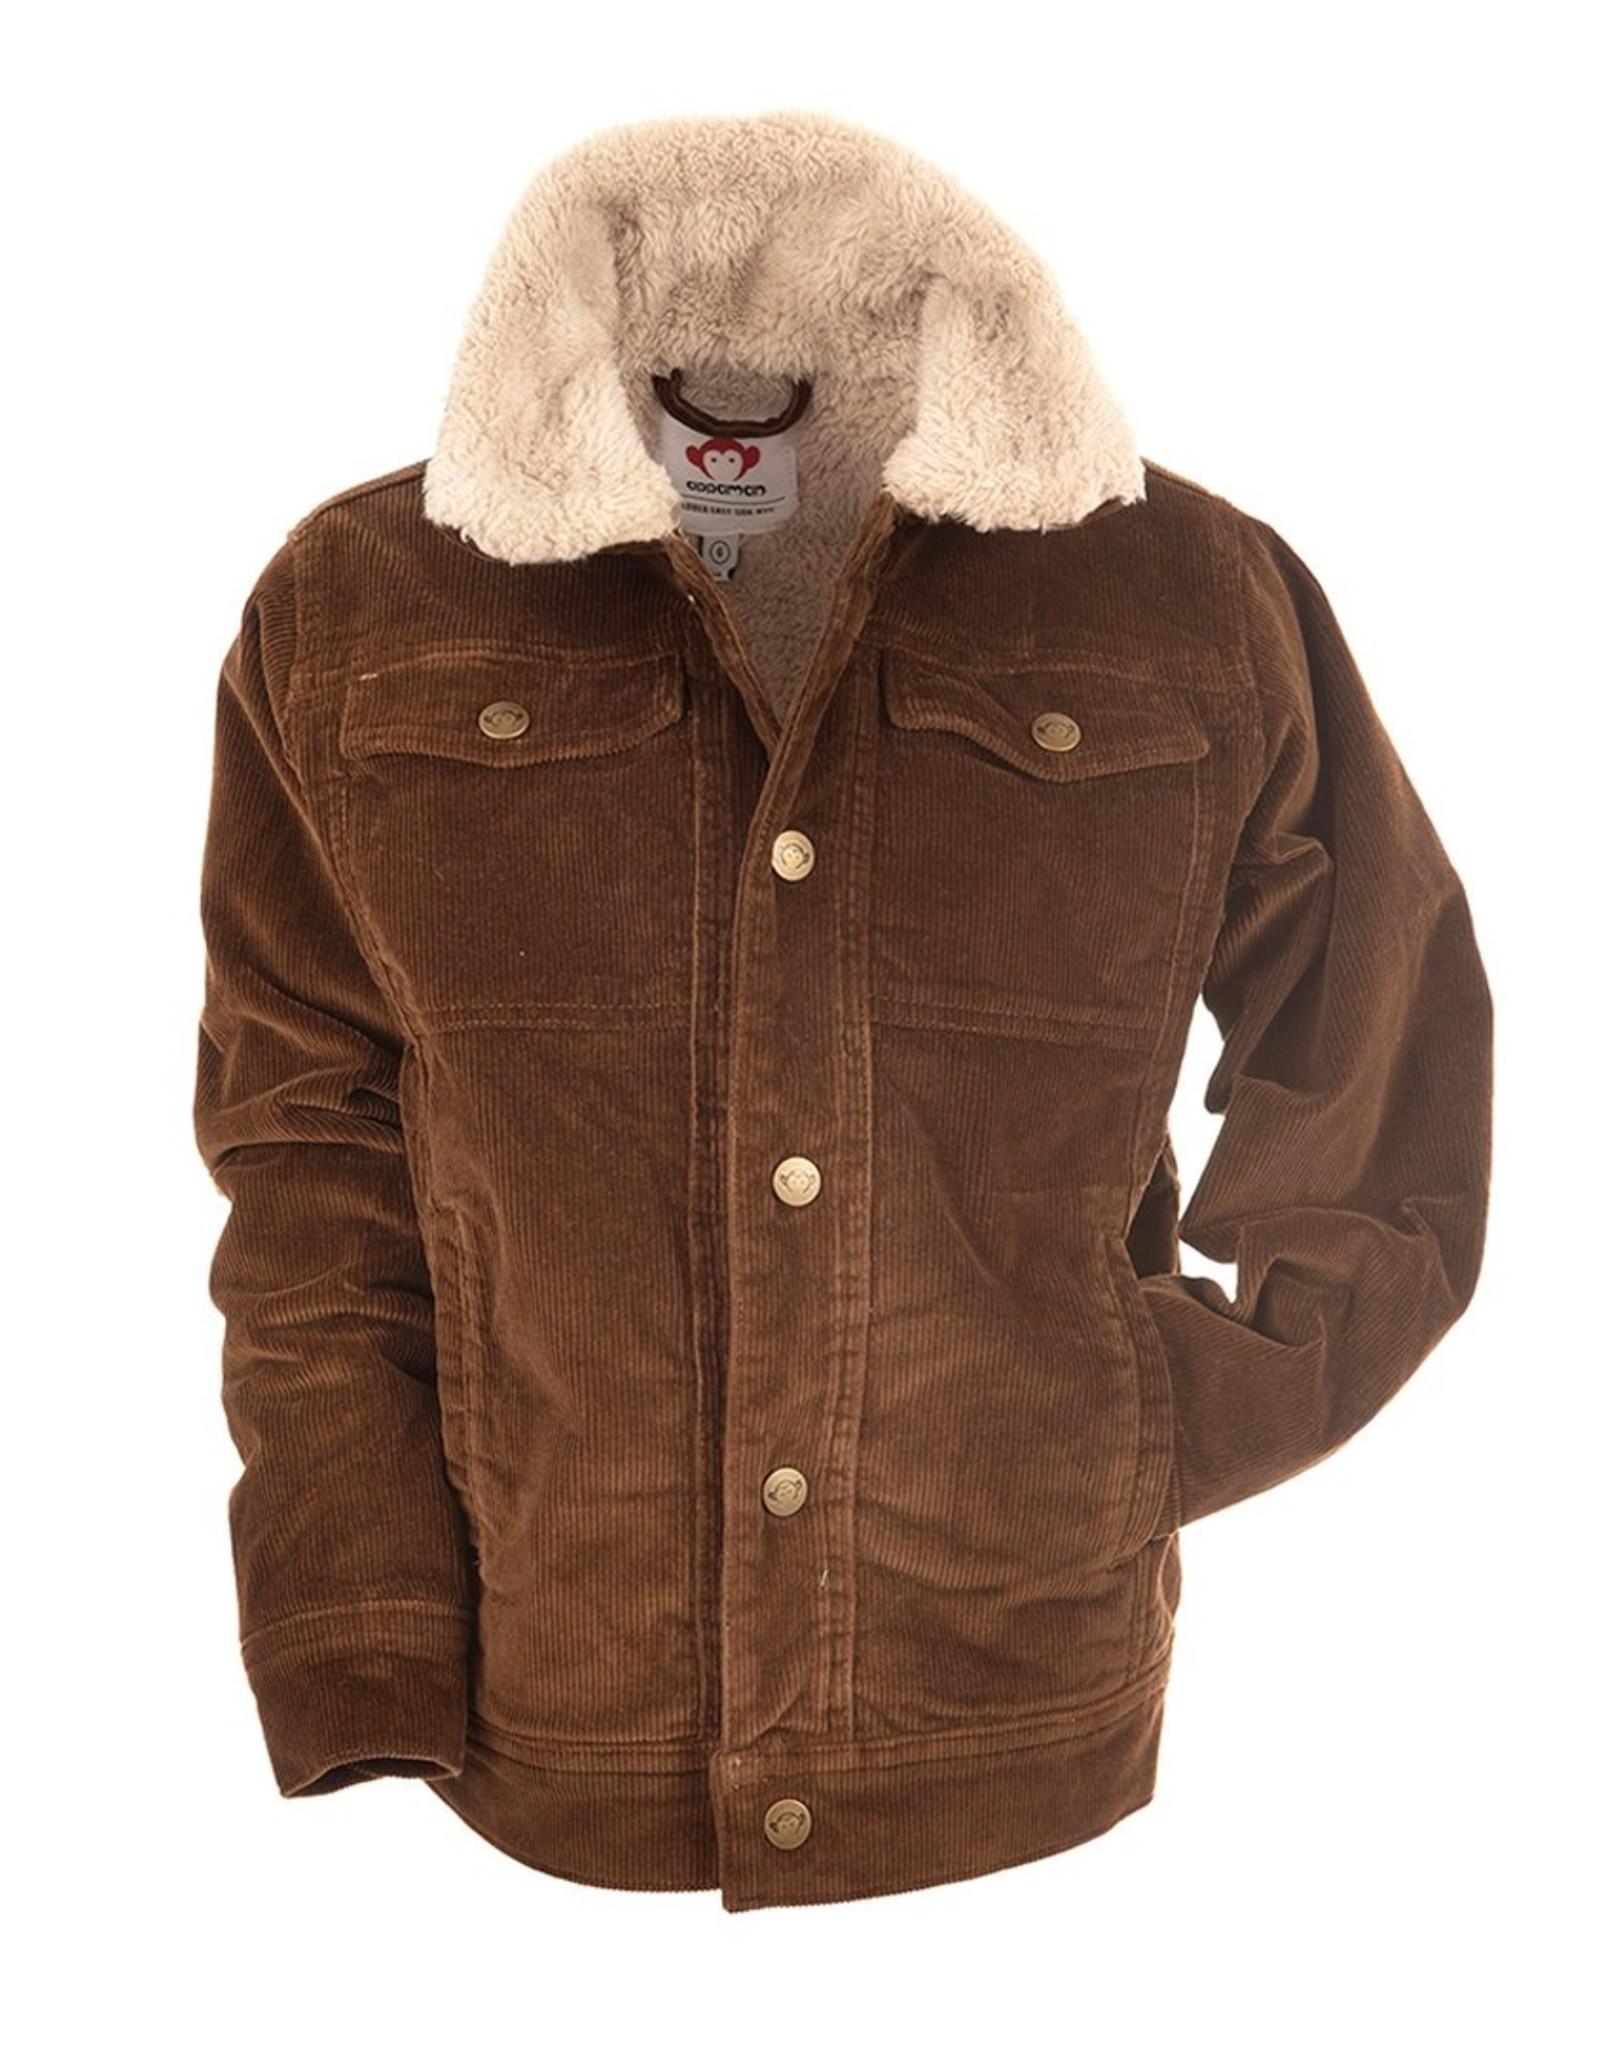 Appaman Appaman Heritage Cord Jacket